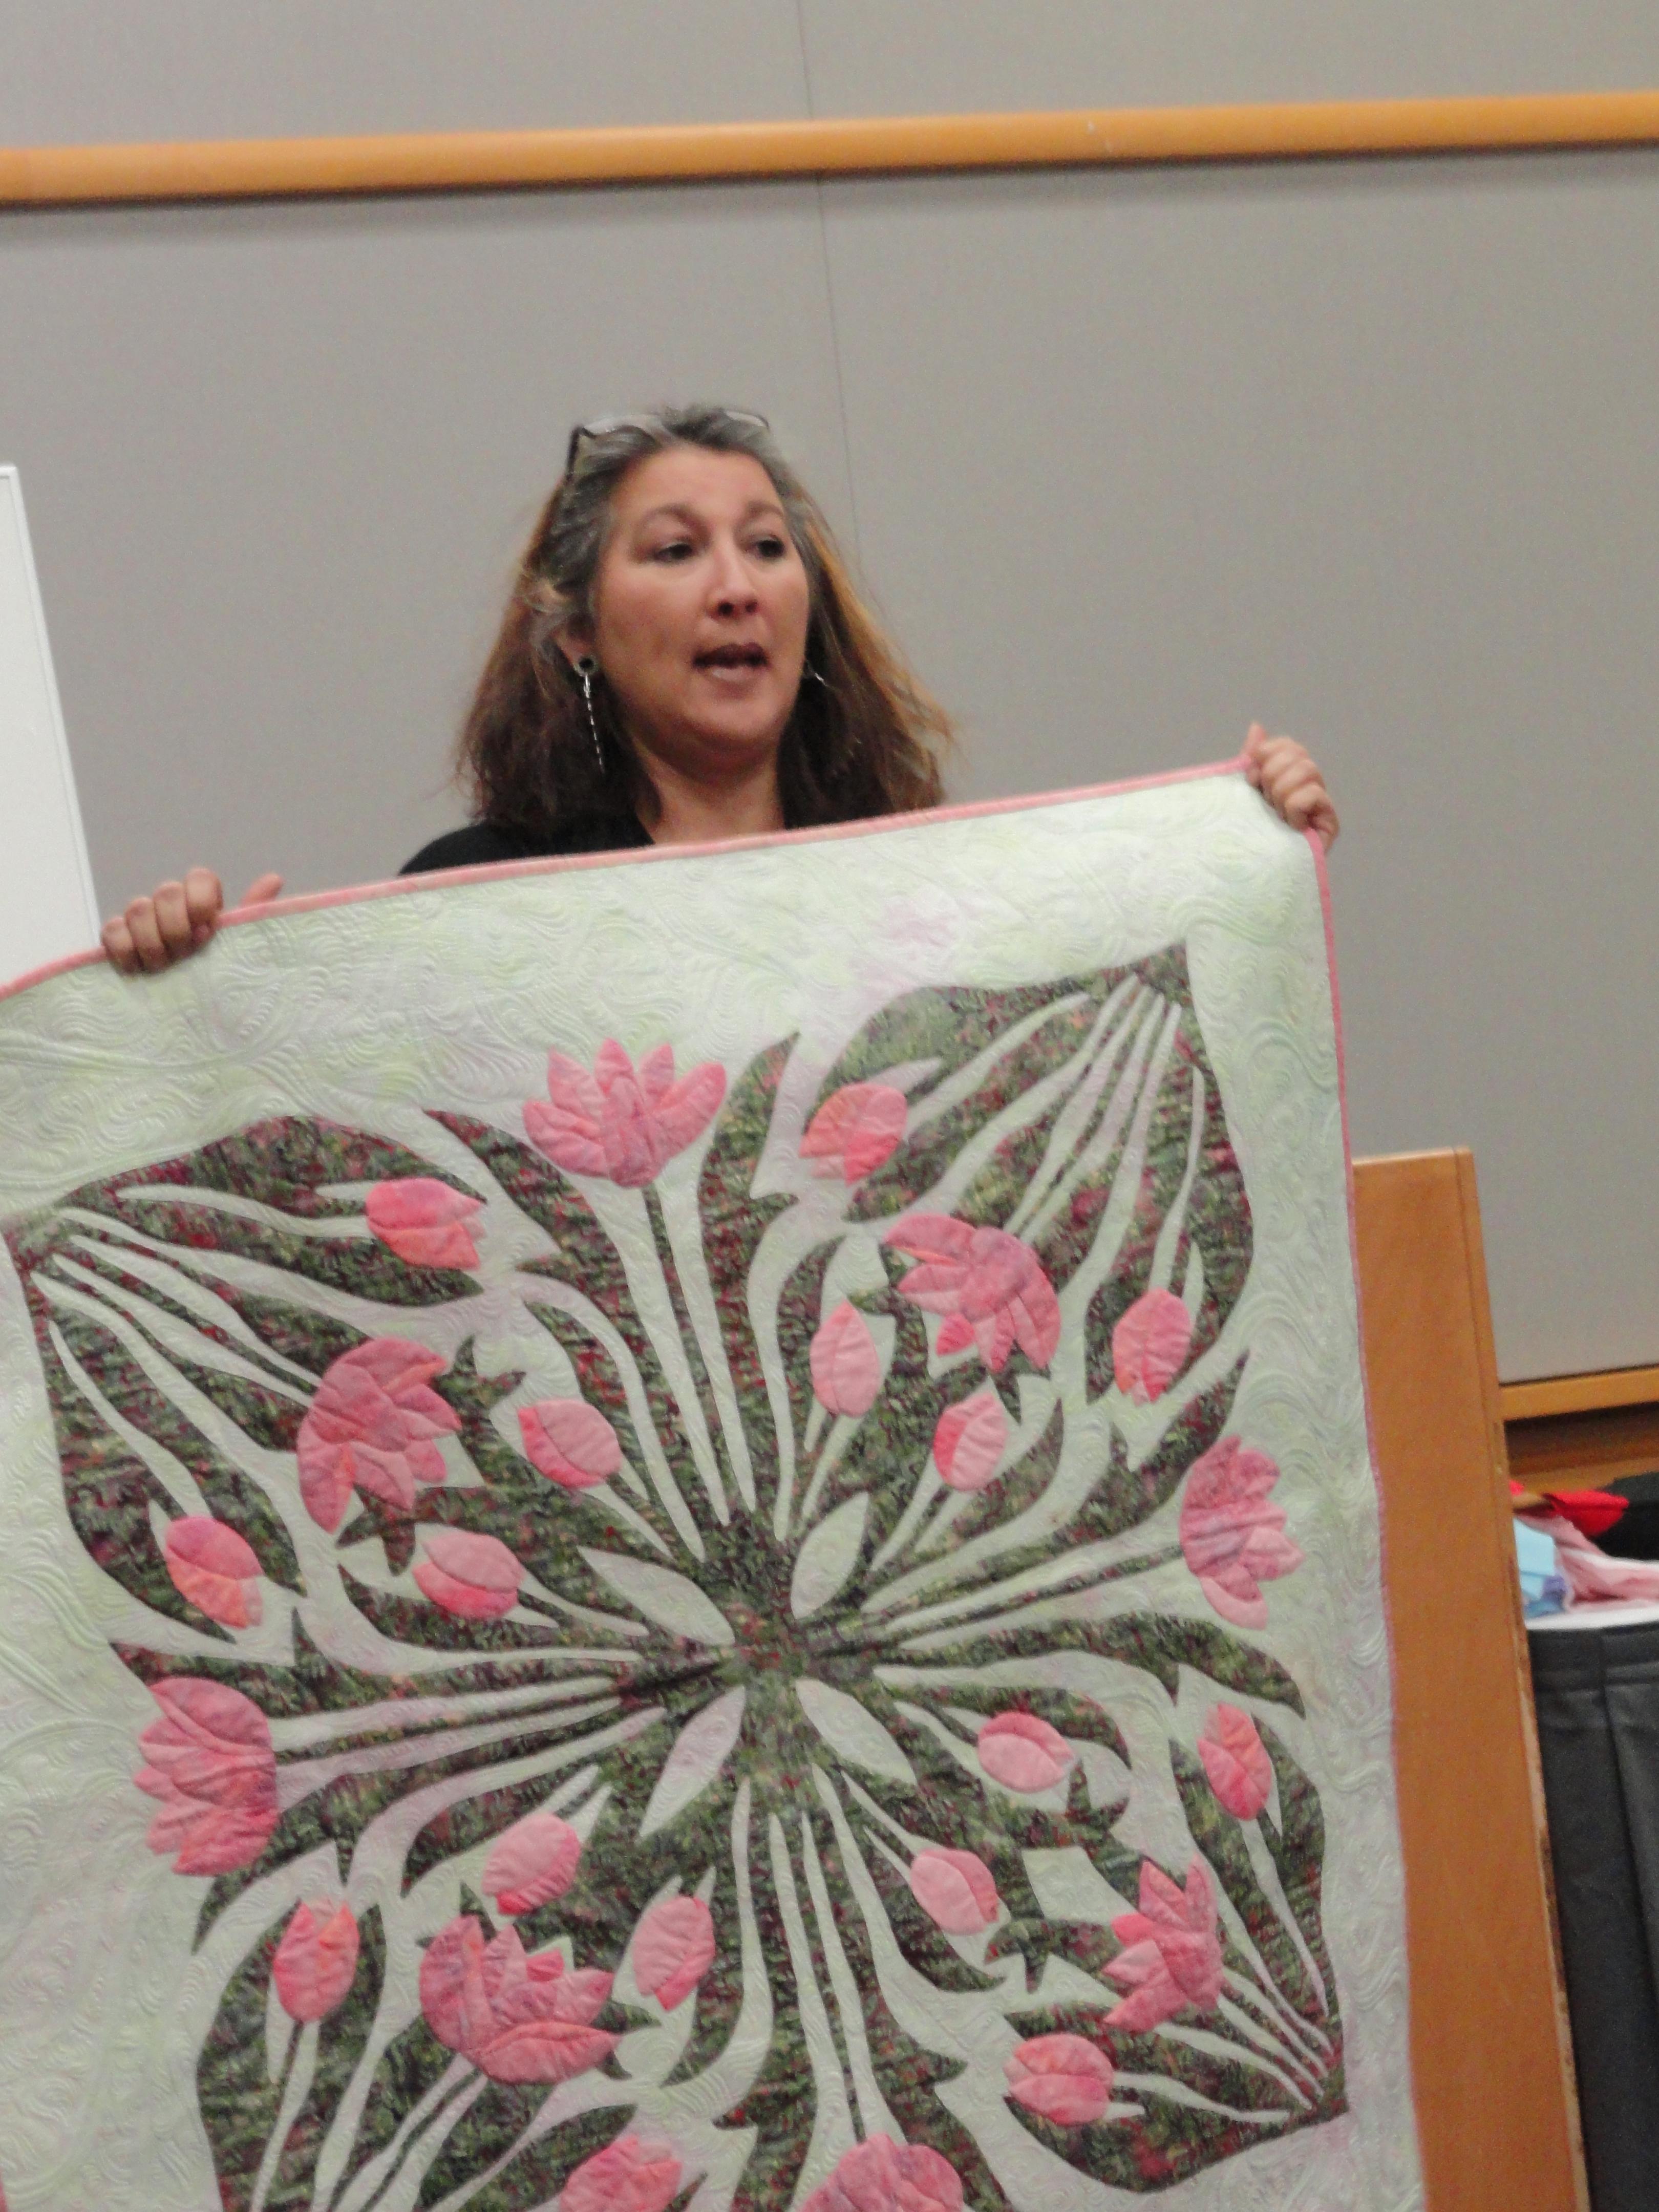 Karen McTavish Quilting class, MQX West. machine quiting, McTavishing, asian art and quilts. Barbara Harms Fiber Art